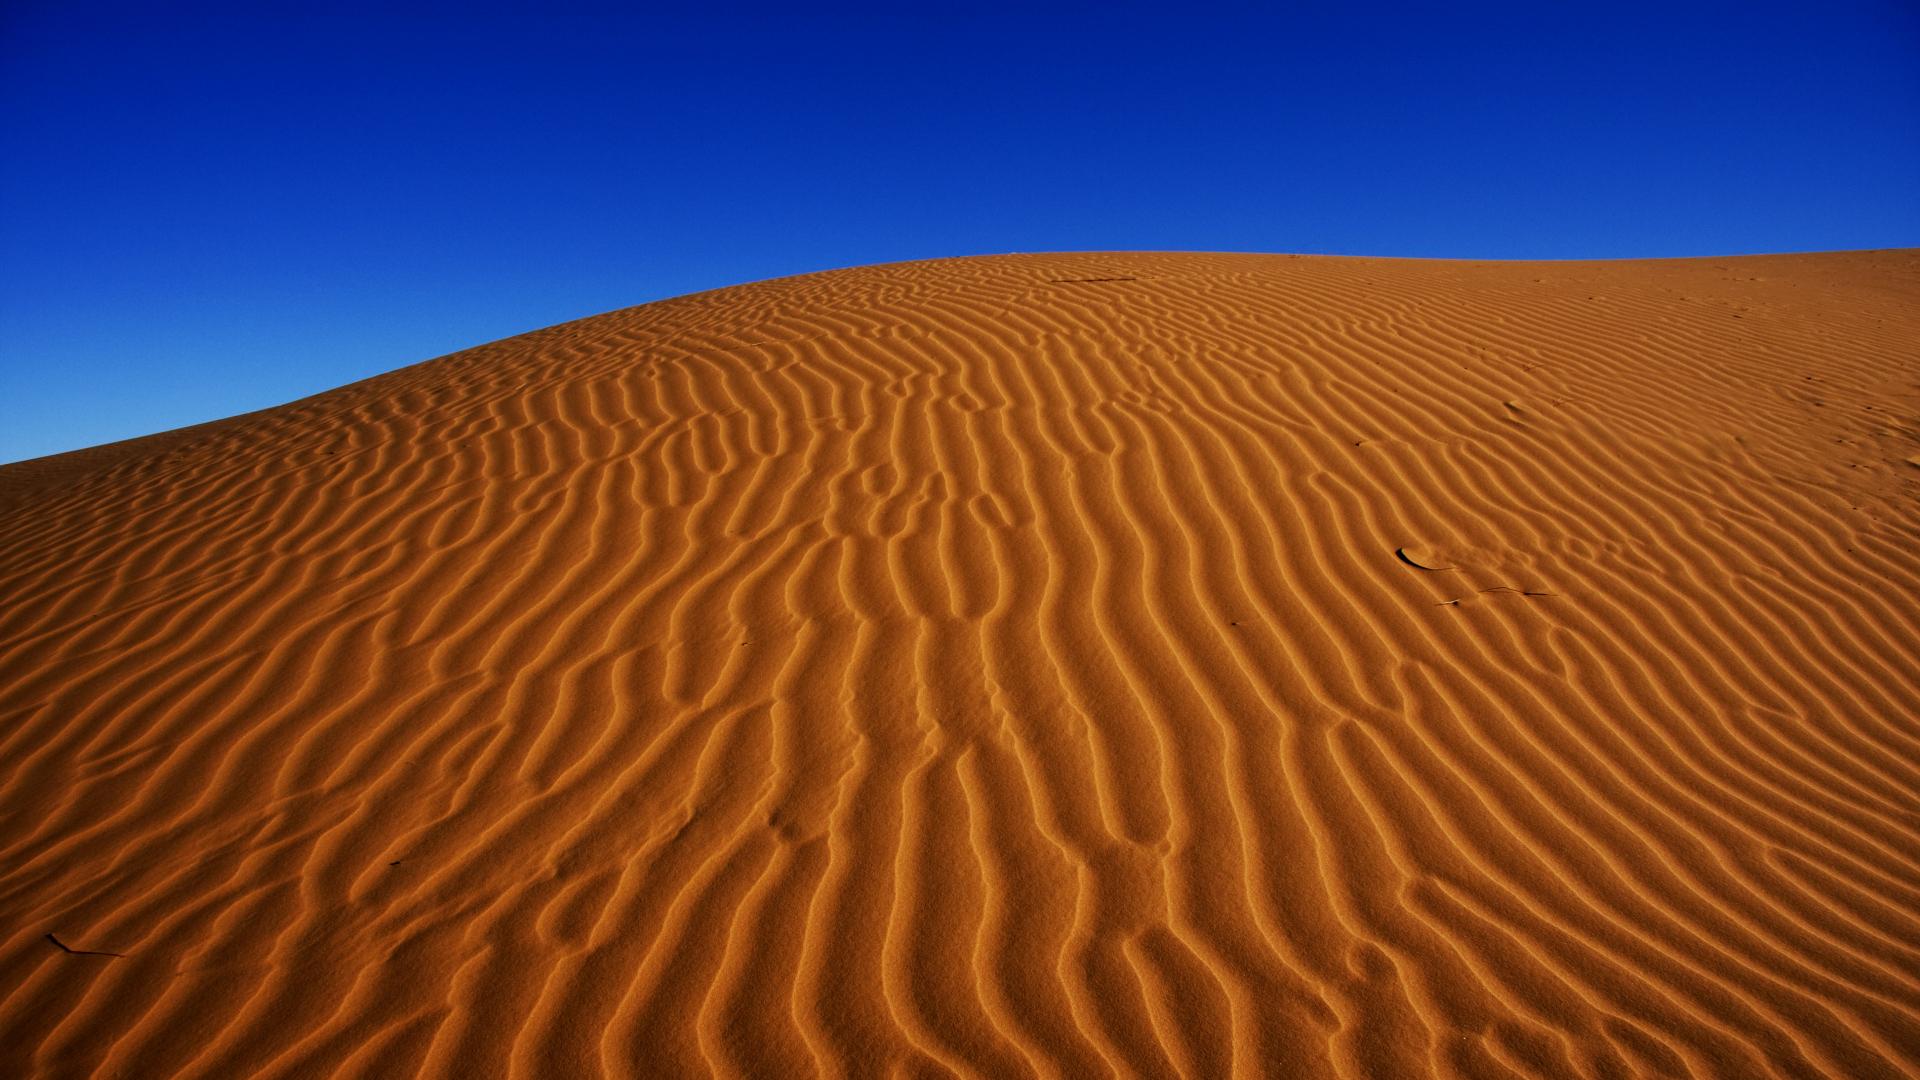 Download 1920x1080 wallpaper desert, nature, sand, dunes ...